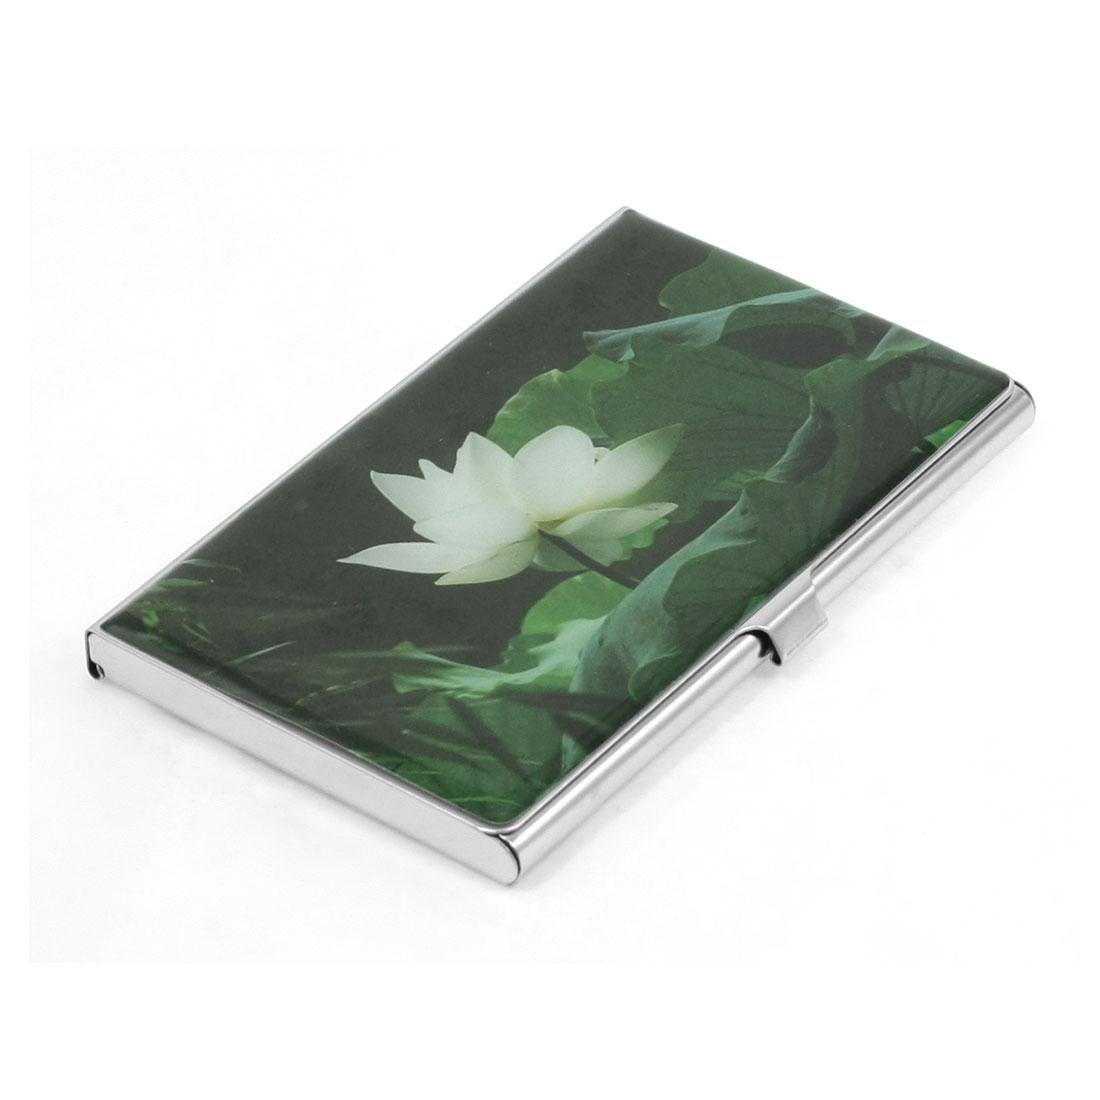 Lotus Leaf Flower Pattern Mirror Polished Metal Business Name Card Holder Dark Green